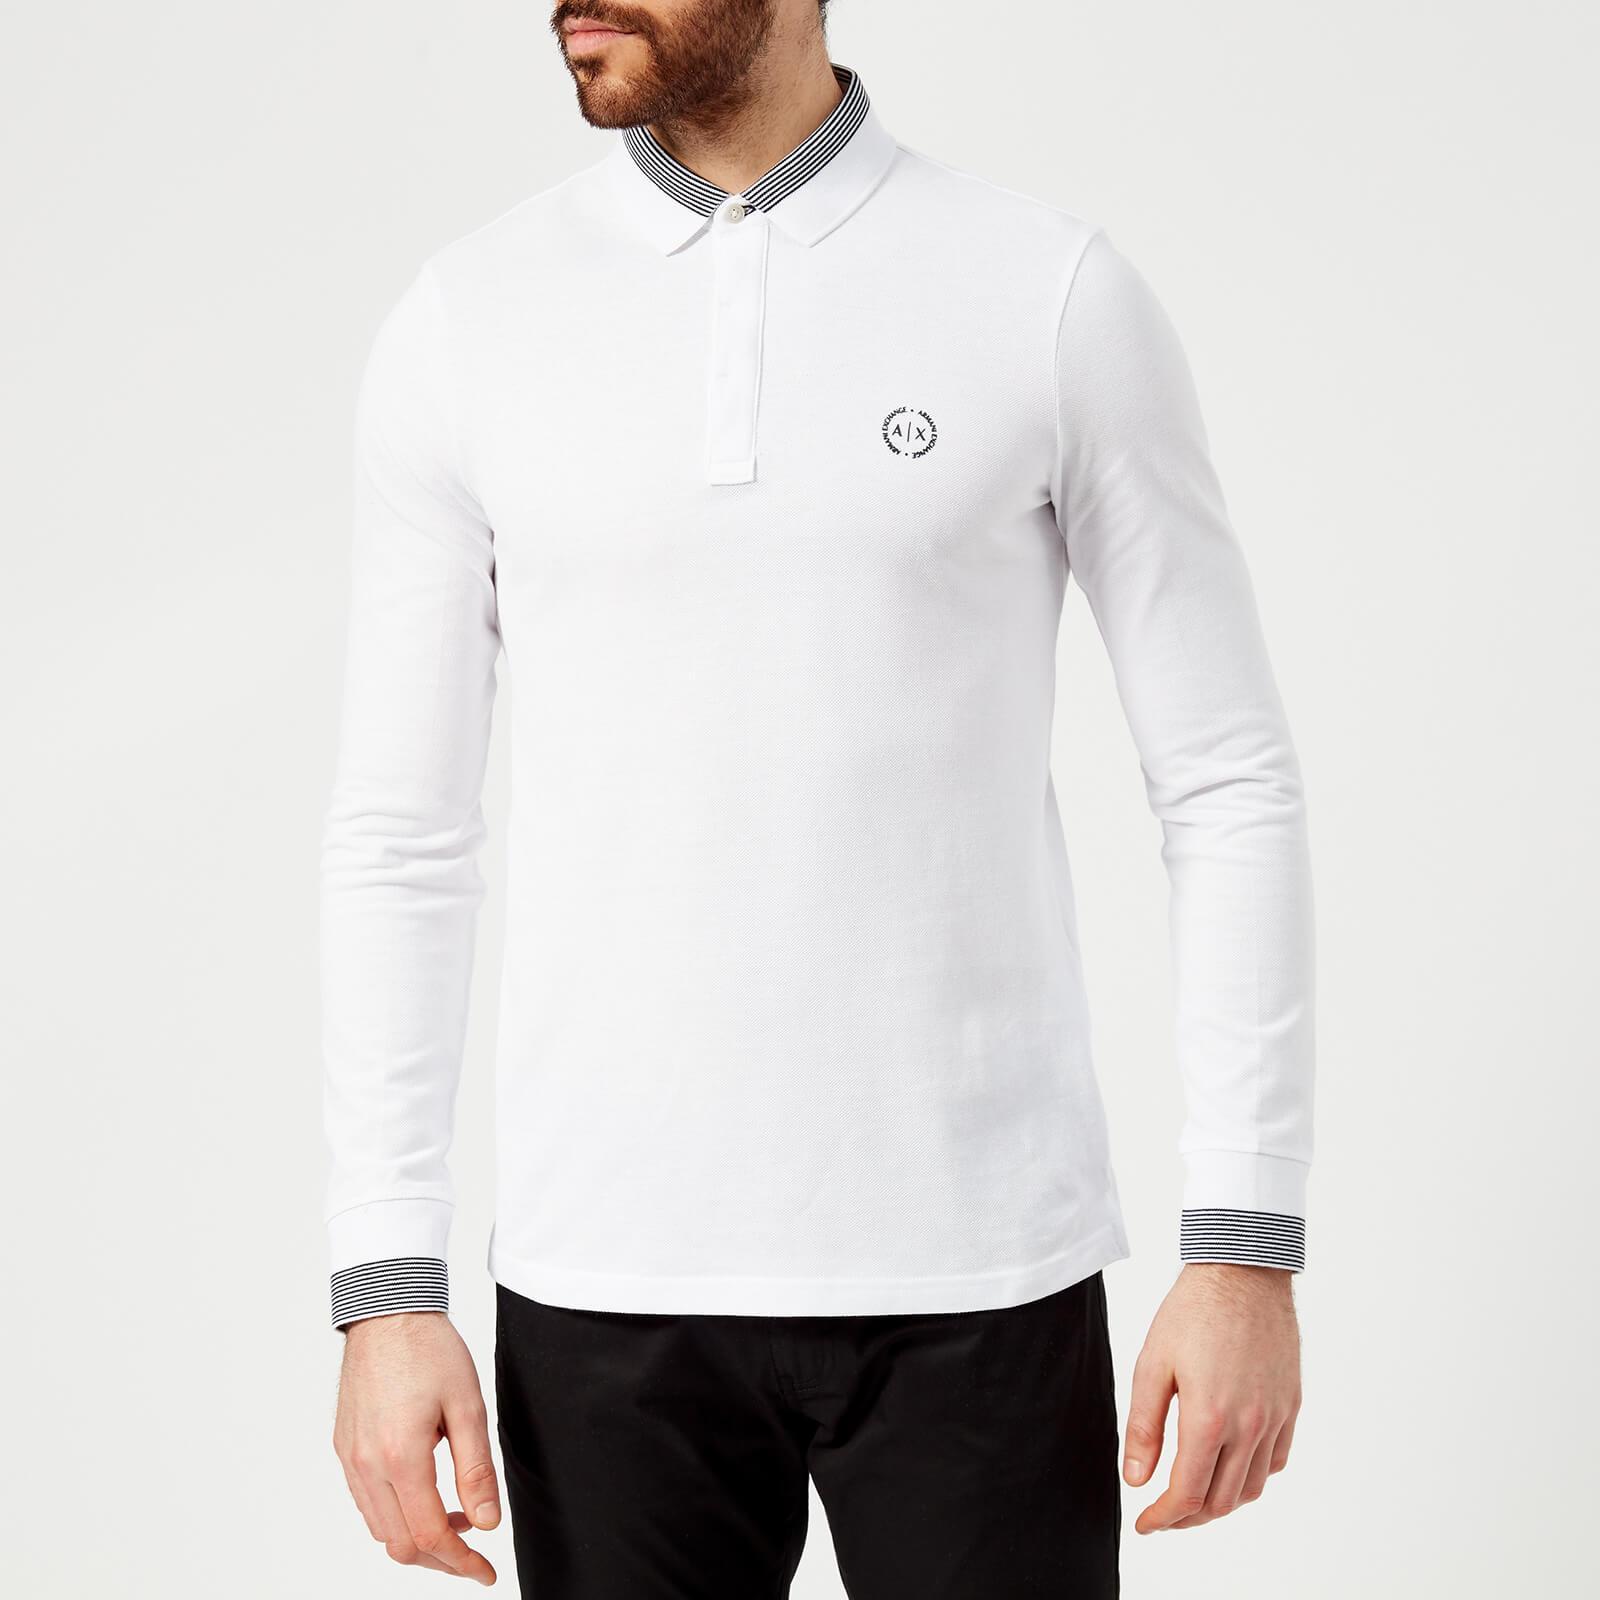 53b37881 Armani Jeans Navy Long Sleeve Pique Polo Shirt - raveitsafe